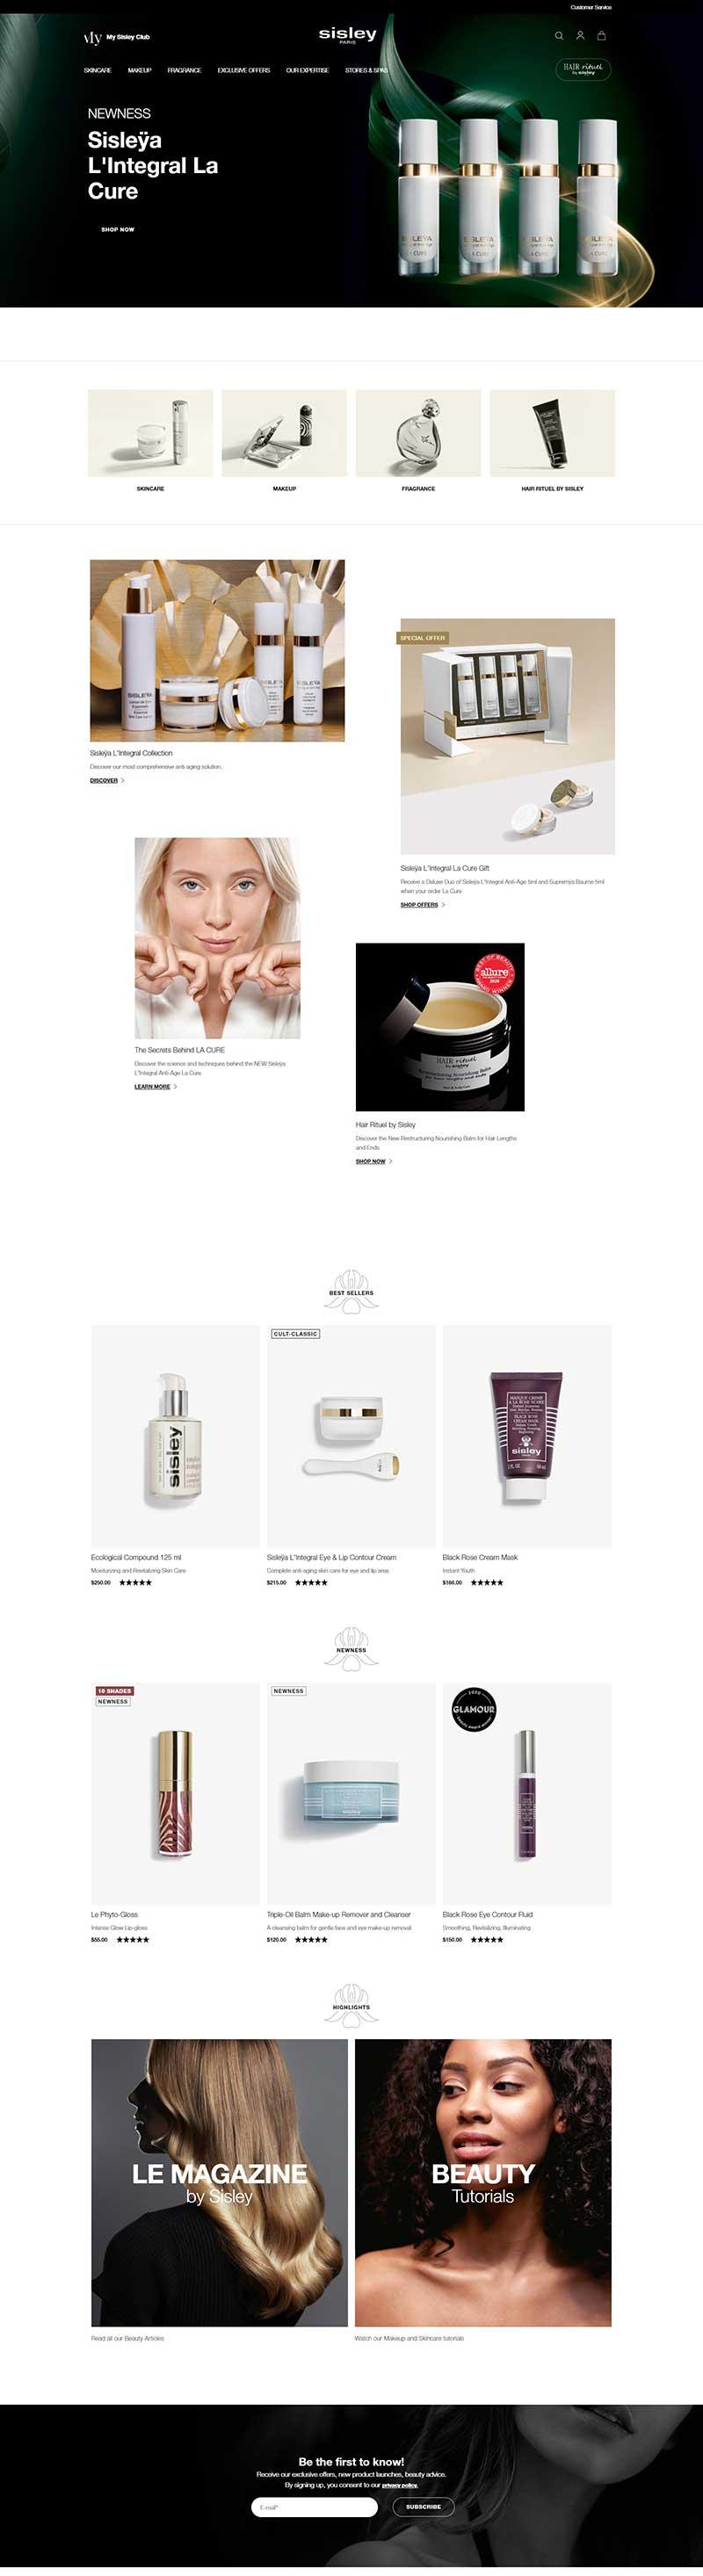 Sisley Paris 法国希思黎植物美容品牌网站